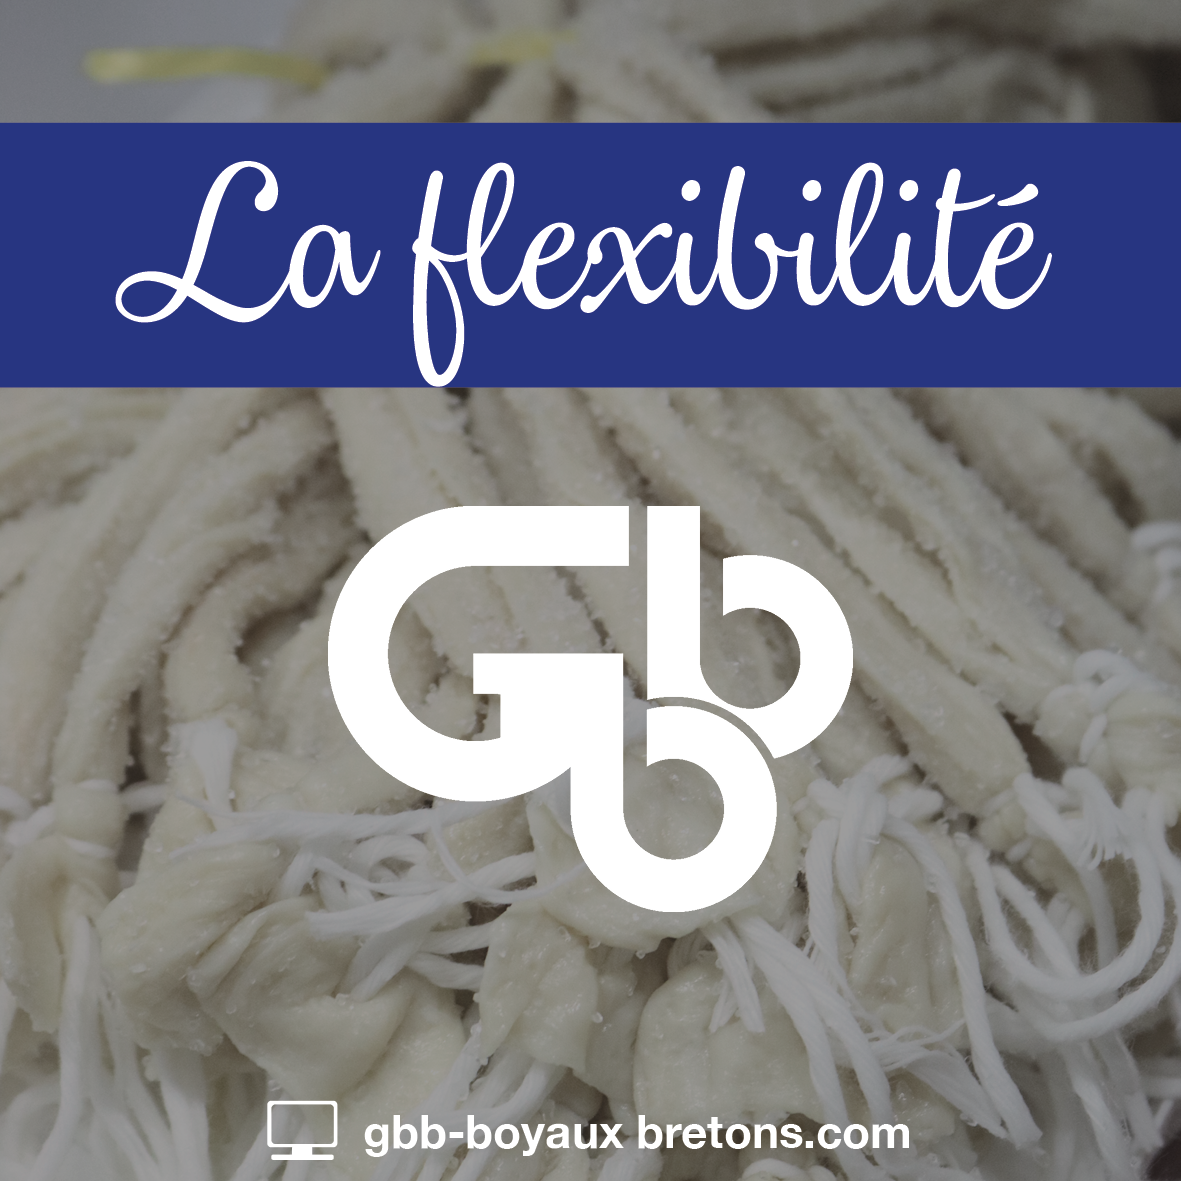 GBB Boyaux Bretons - Nos valeurs : la flexibilité